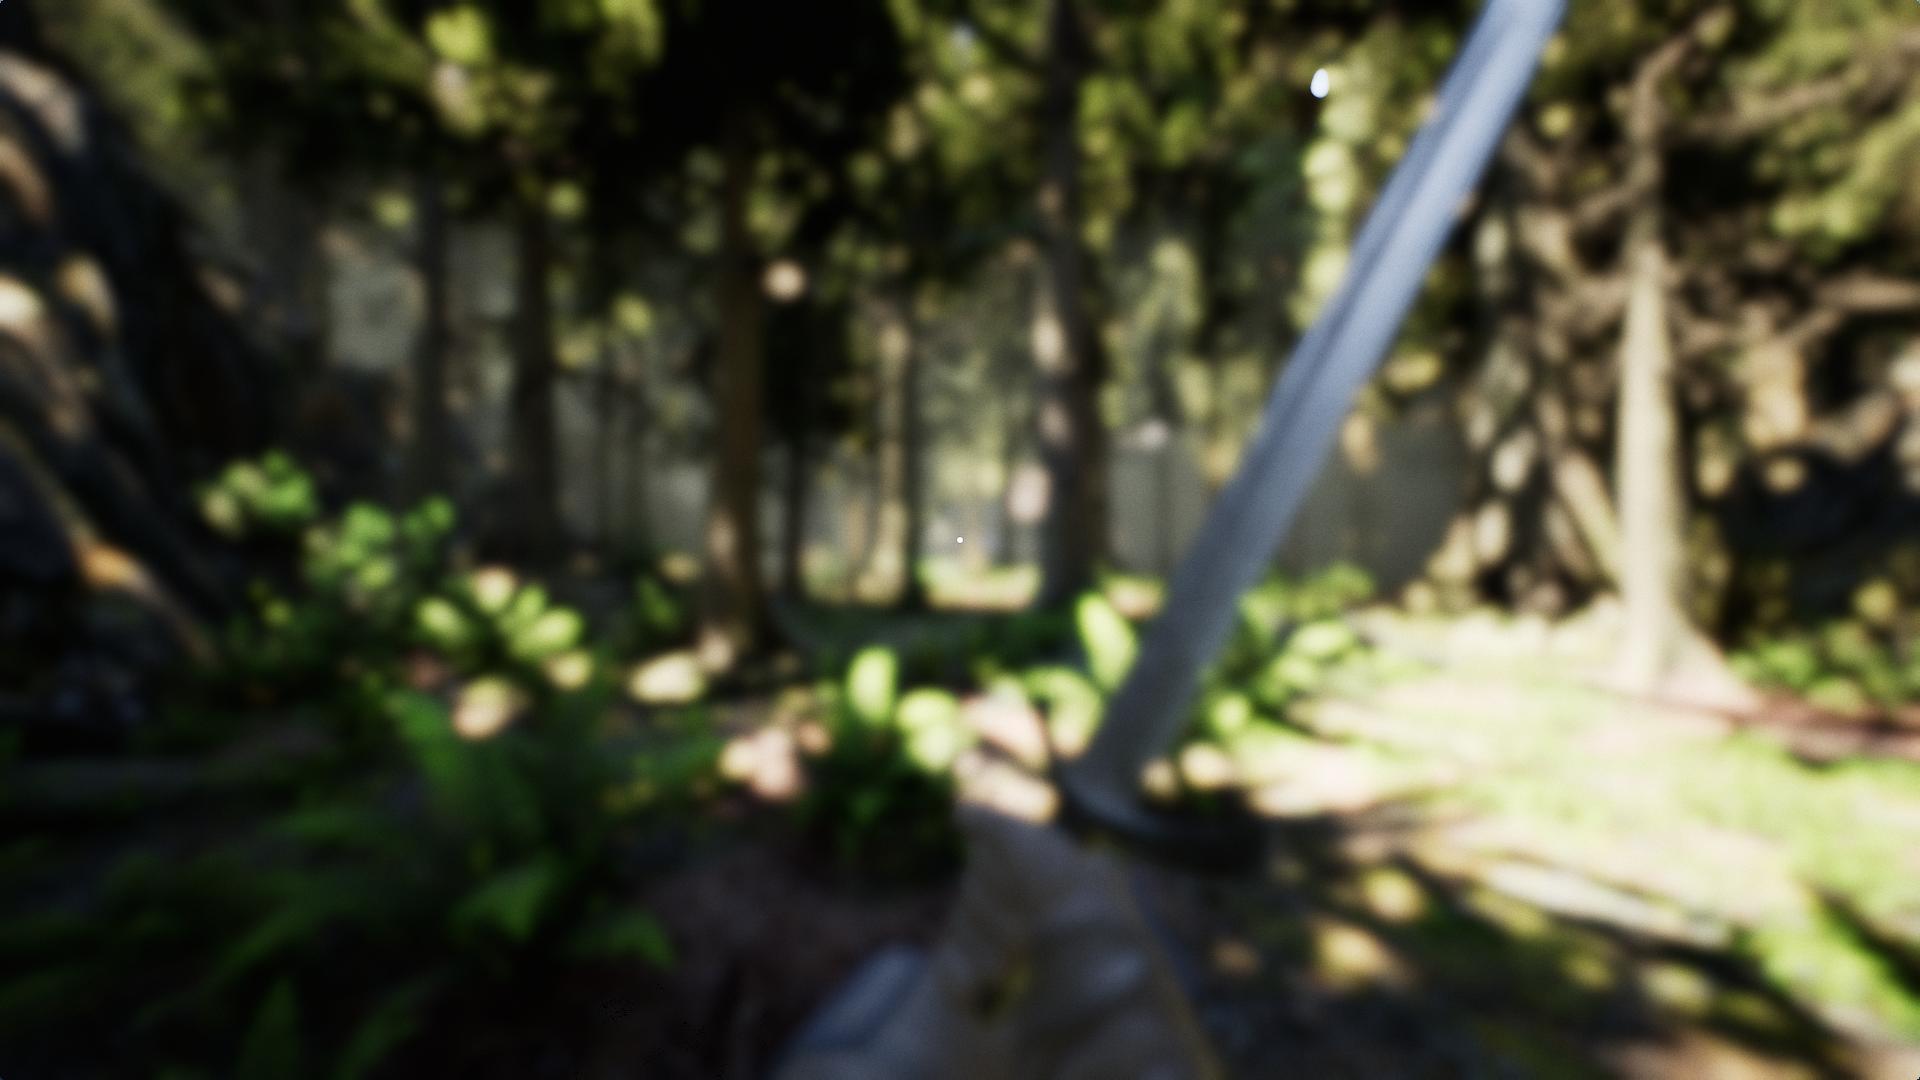 mordhau forest.png